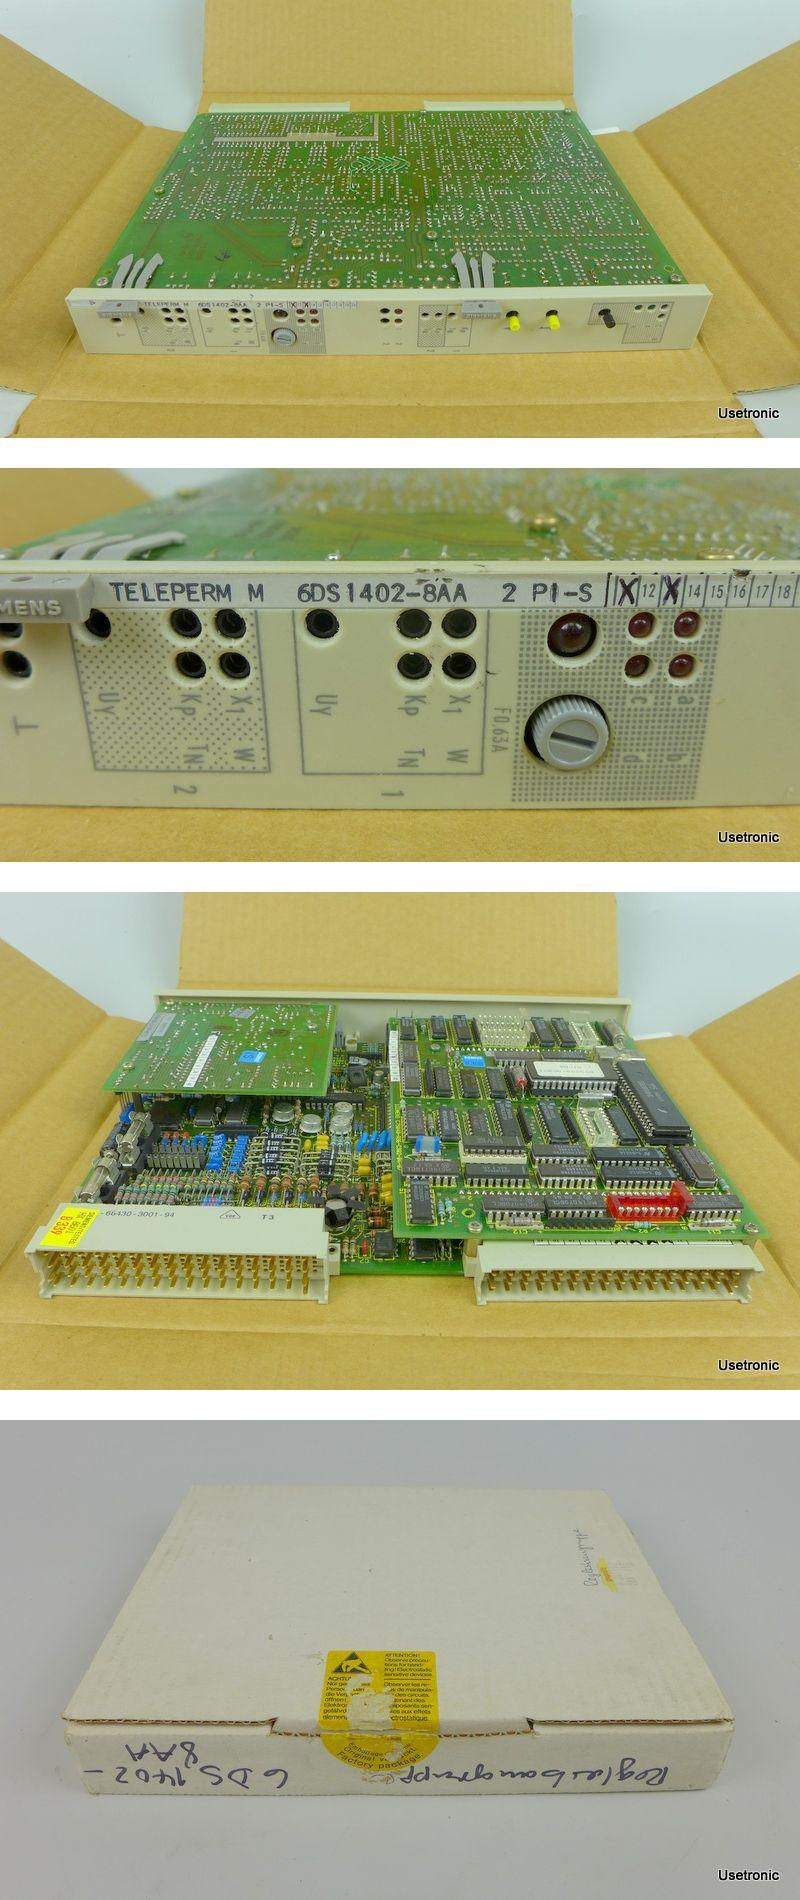 Siemens Teleperm M 6DS1402-8AA 6DS1 402-8AA